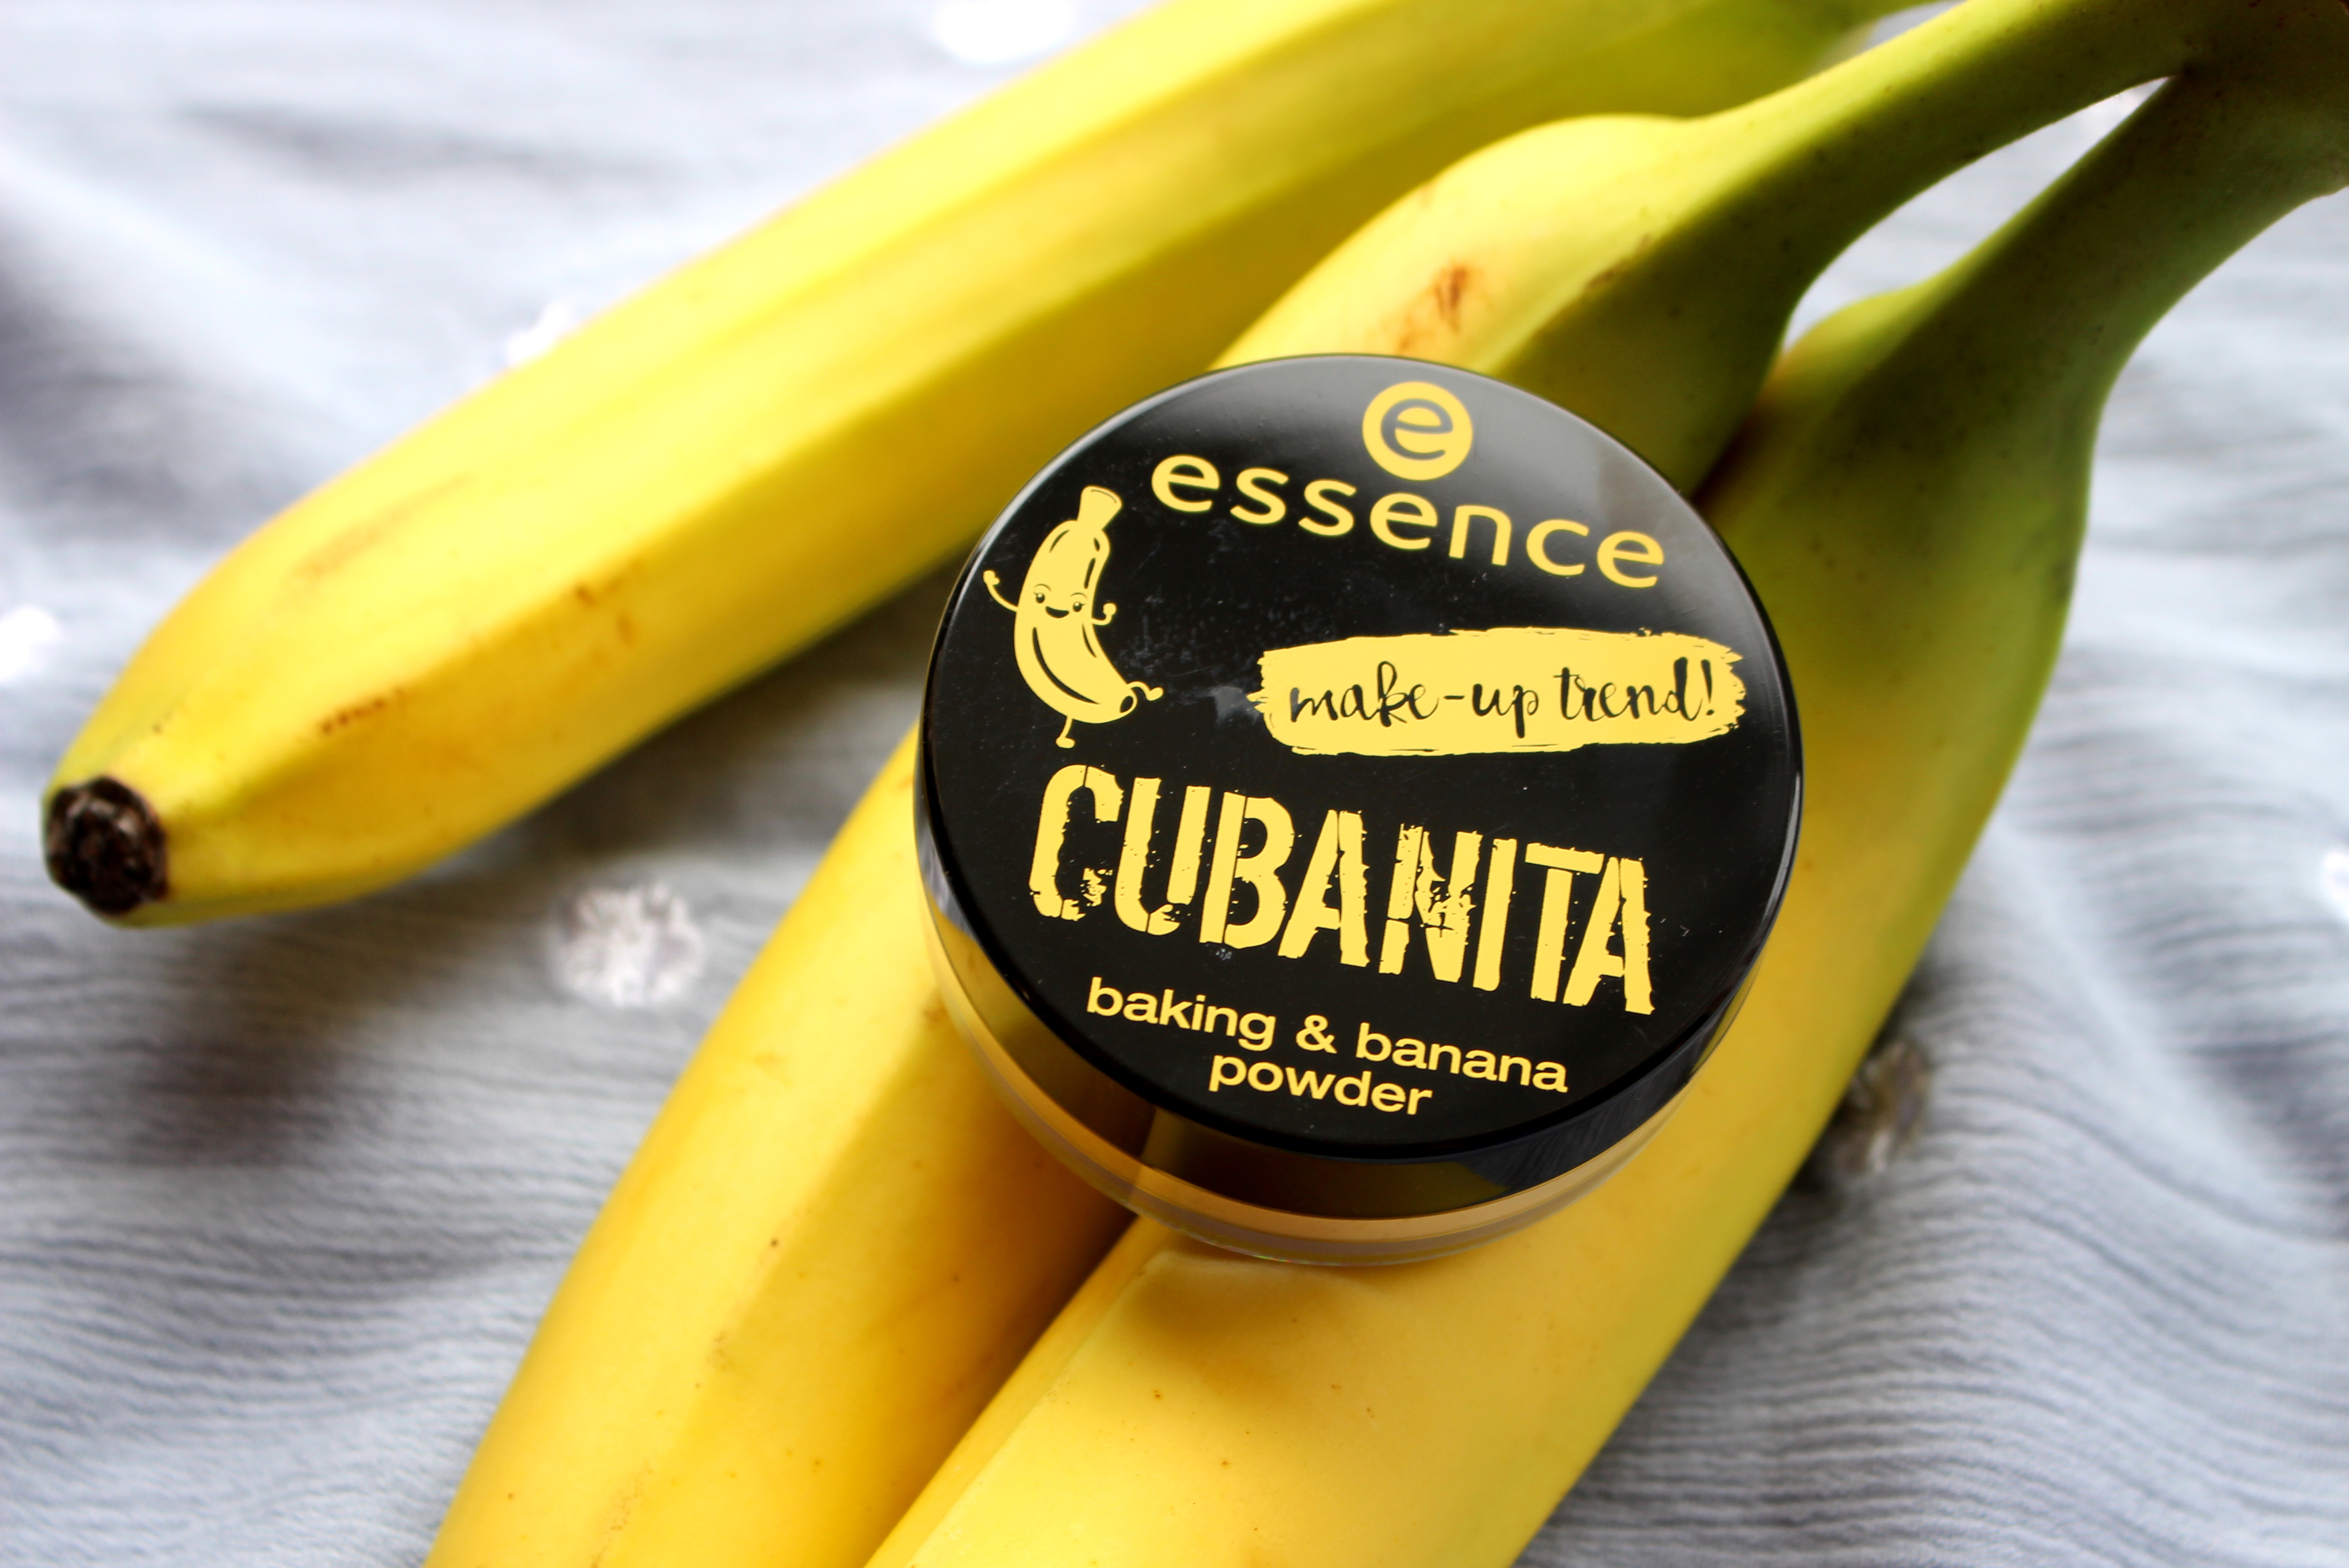 essence_cubanita_makeupinflight_baking_and_banana_powder_2